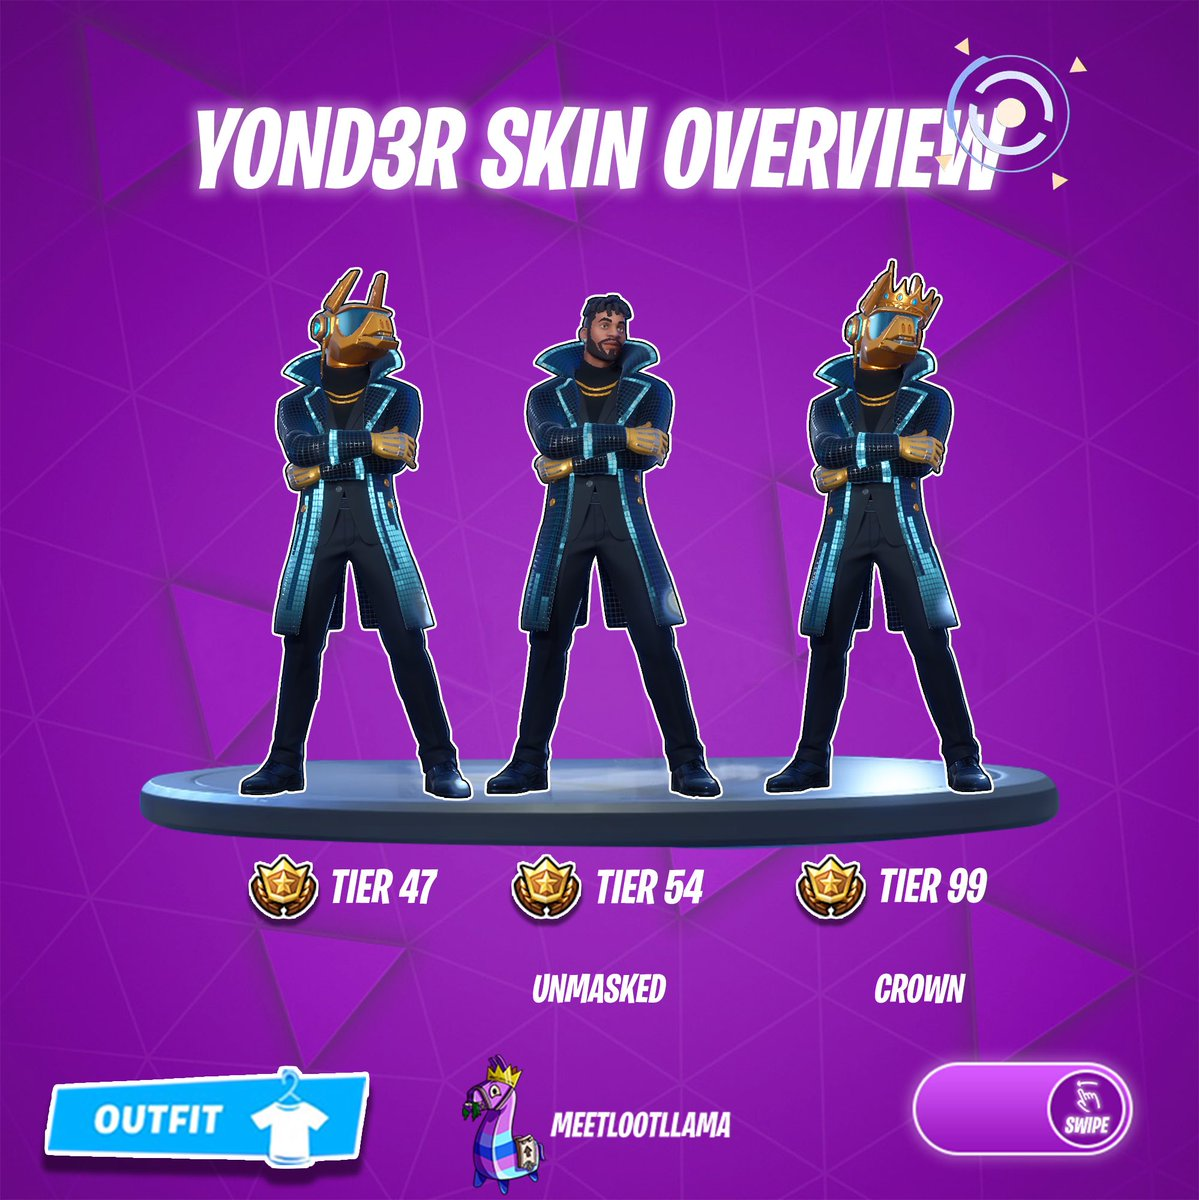 Mll On Twitter Yond3r Skin Overview Fortnite